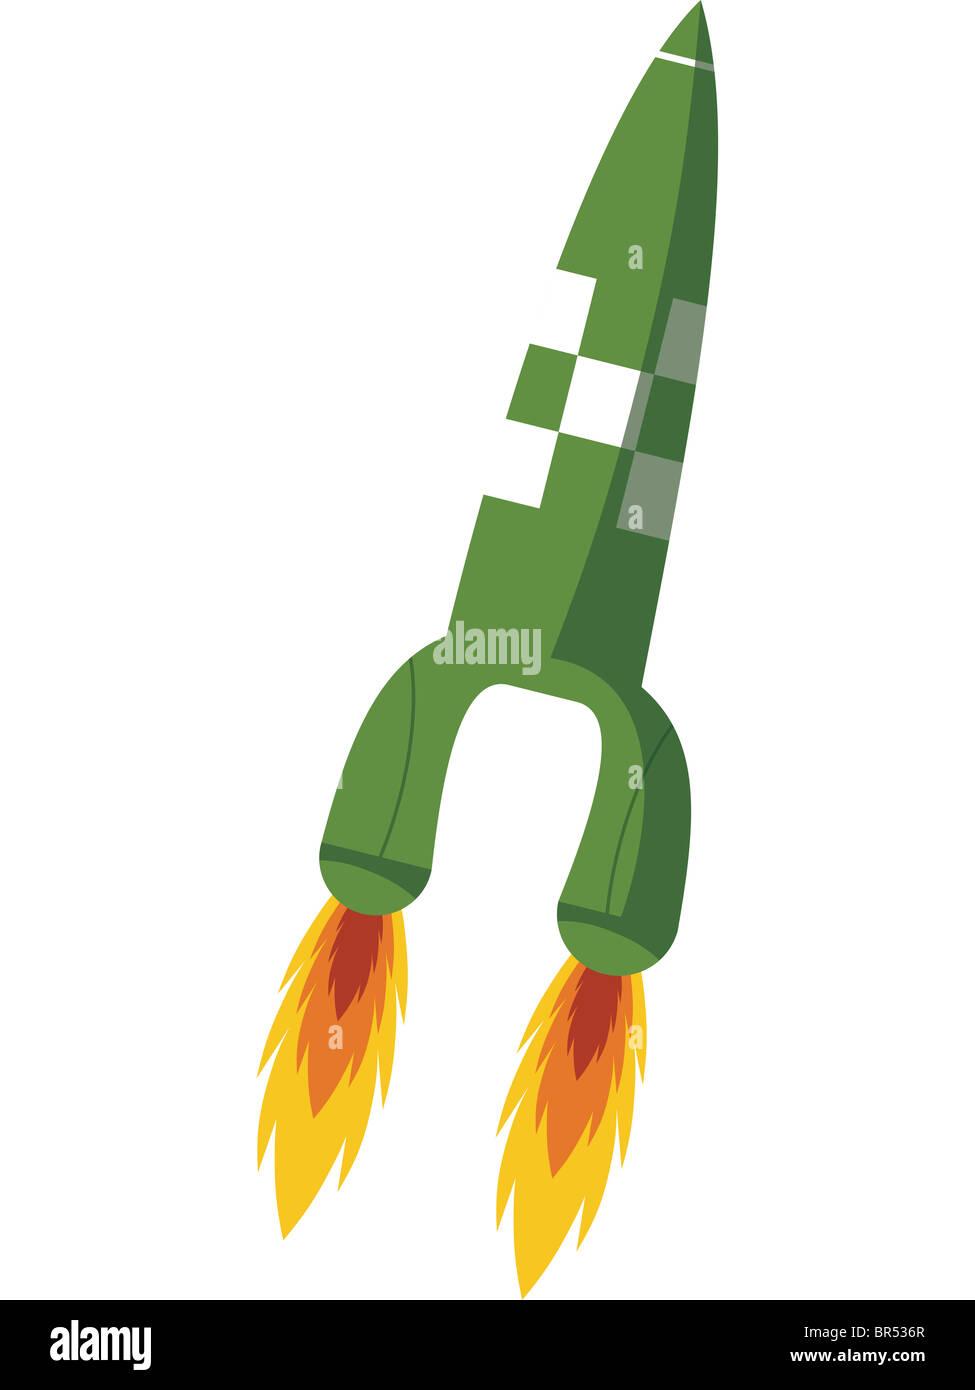 A rocket ship blasting off - Stock Image